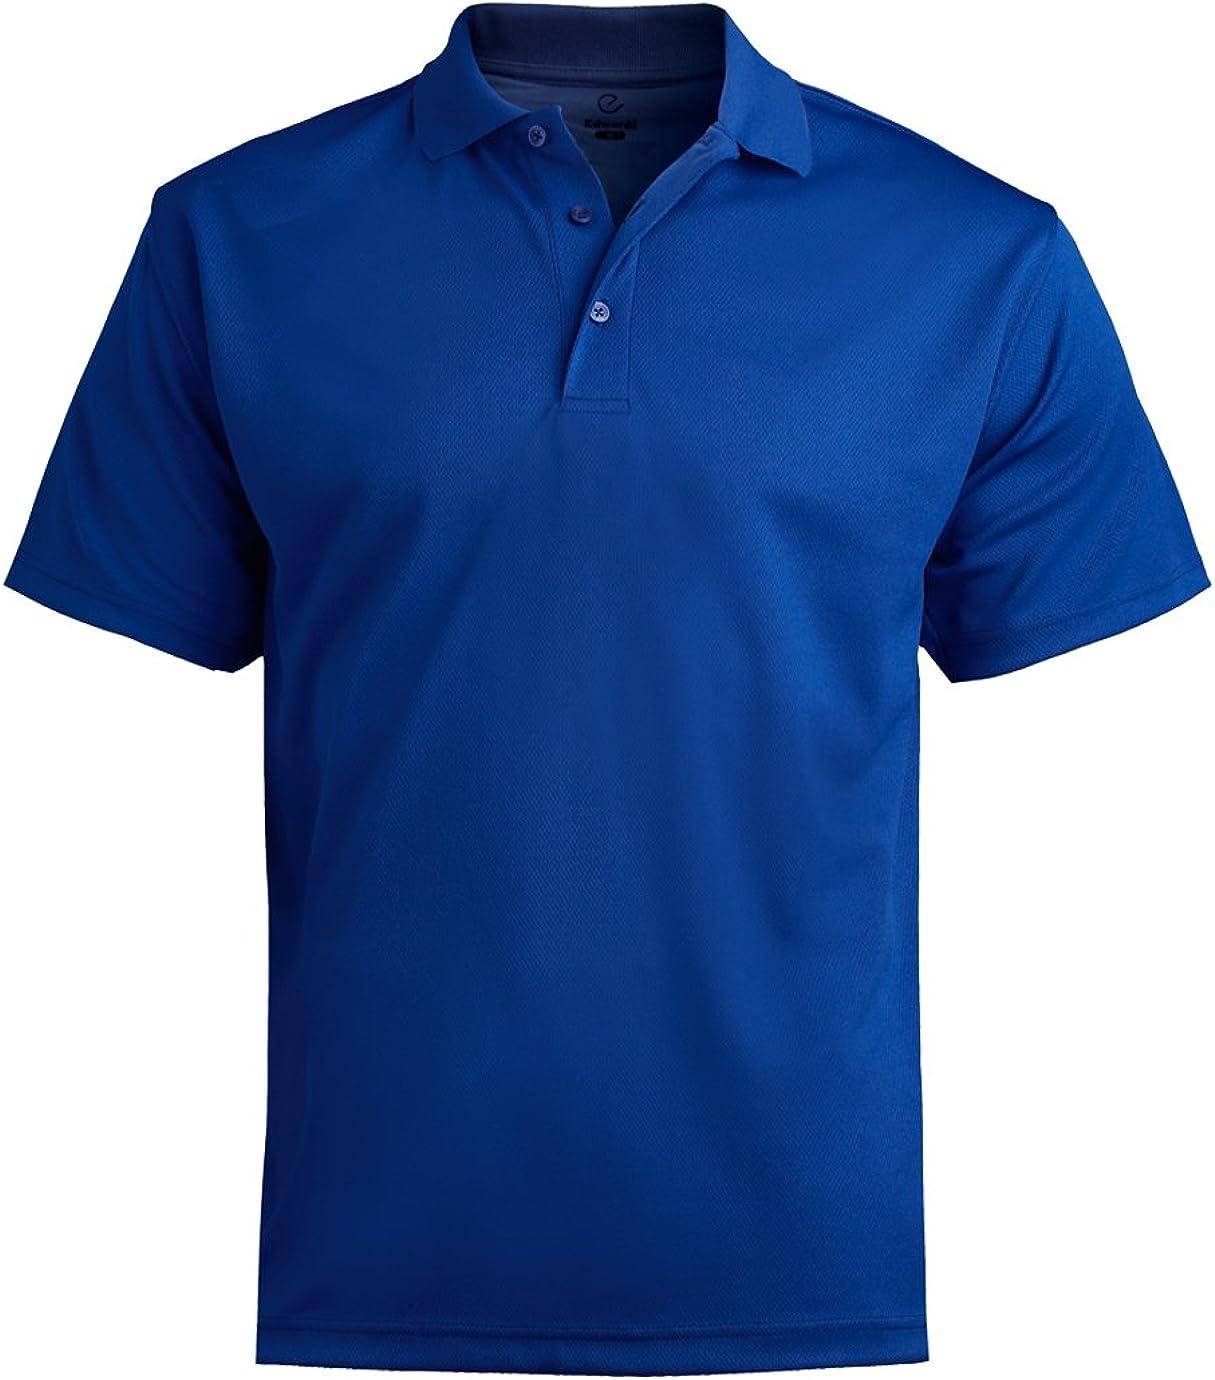 Edwards Garment Men's Big And Tall Dry-Mesh Hi-Performance Polo Shirt_ROYAL_6XLT